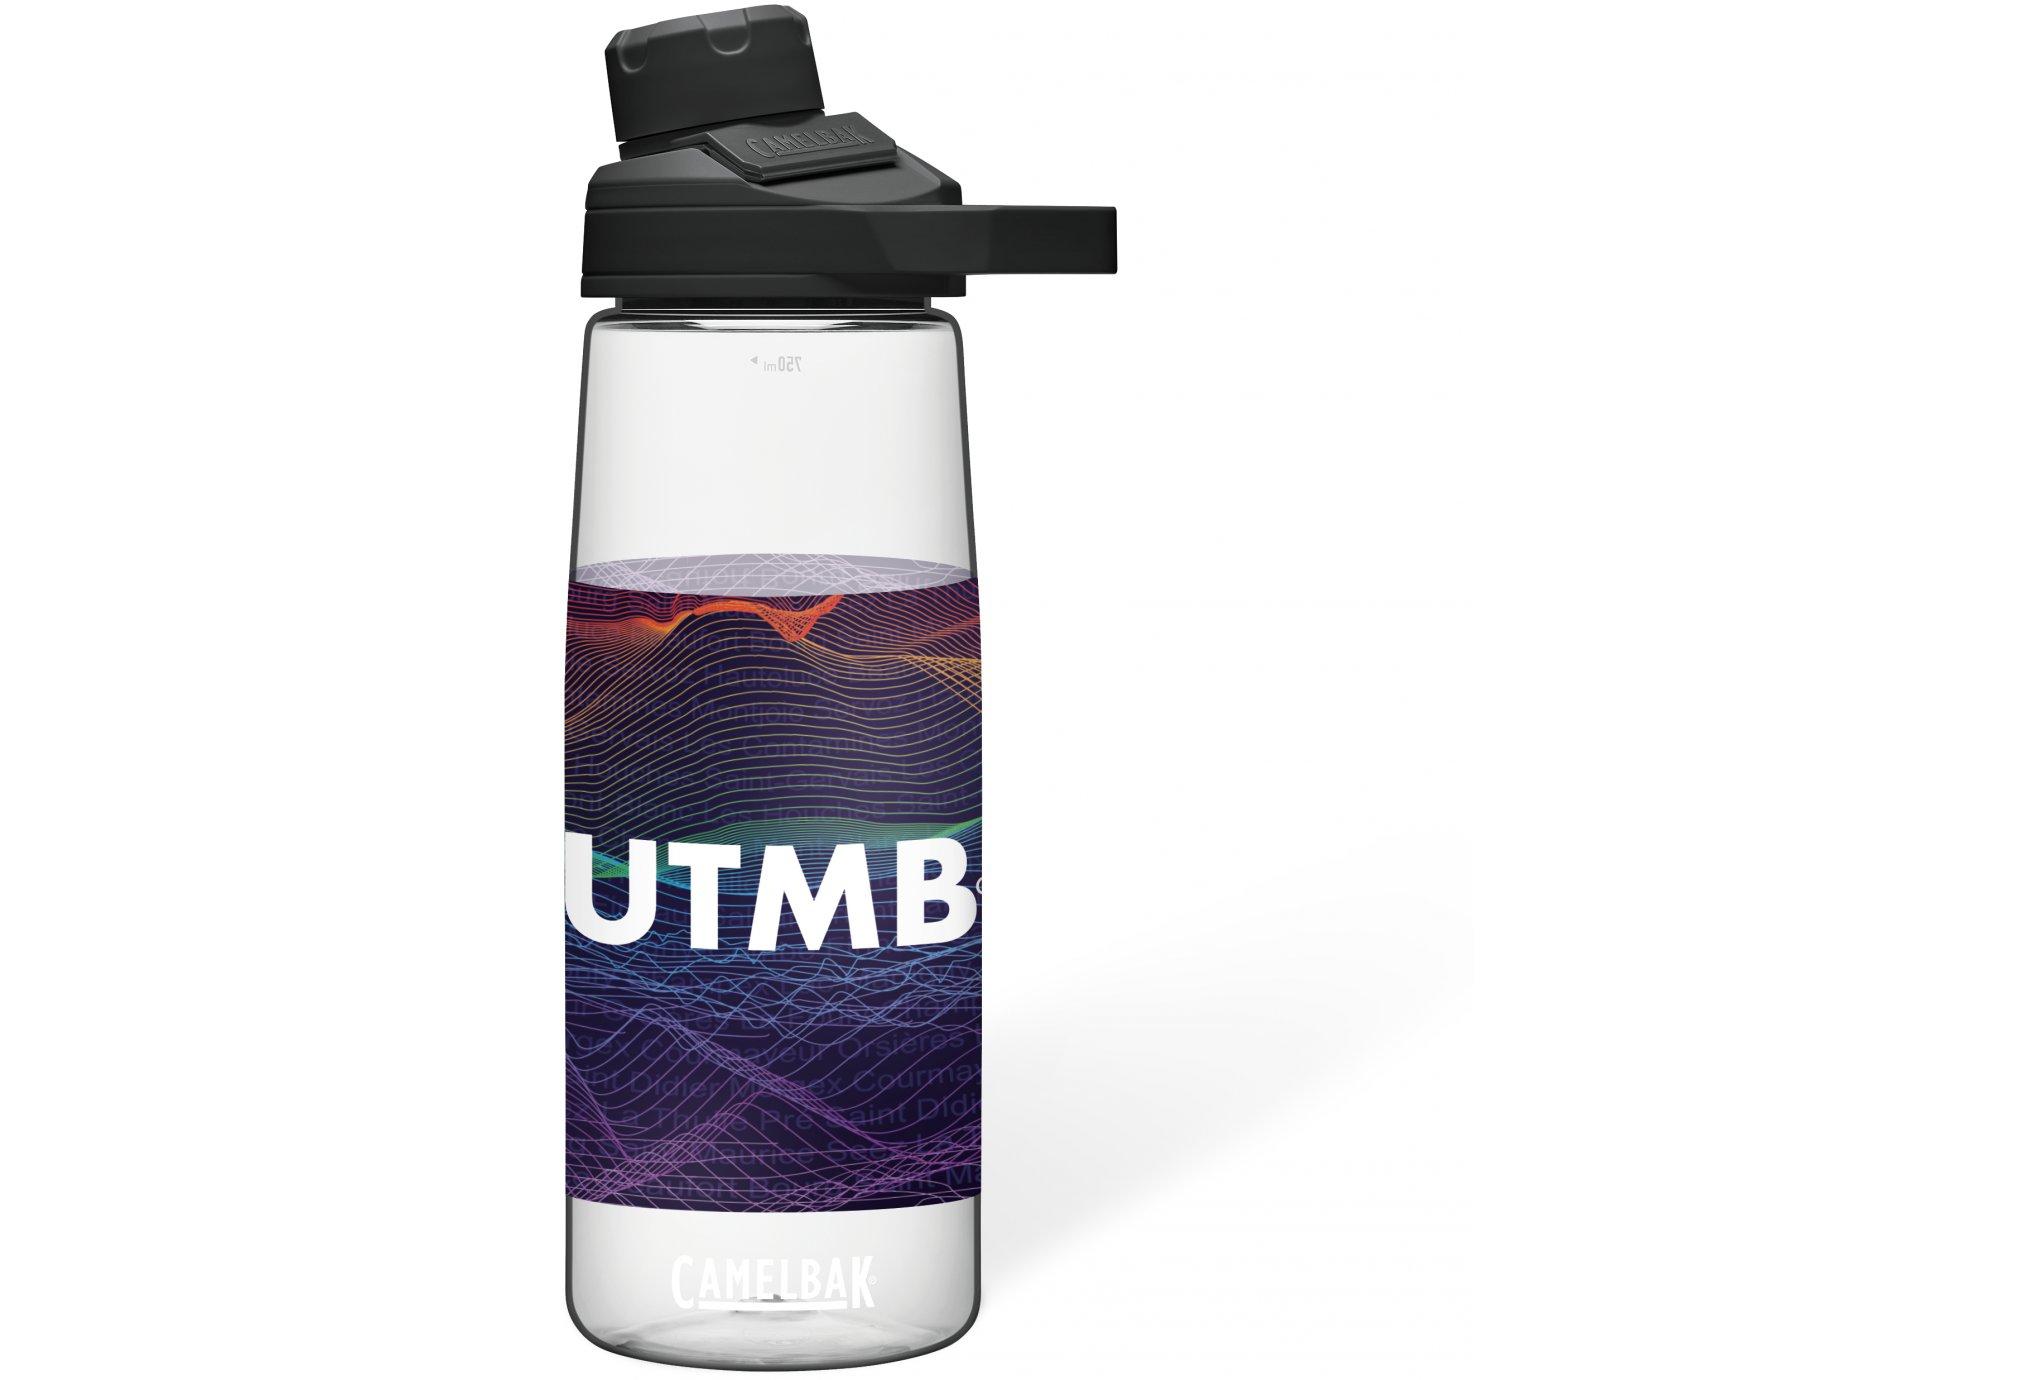 Camelbak Gourde Chute Mag UTMB Sac hydratation / Gourde